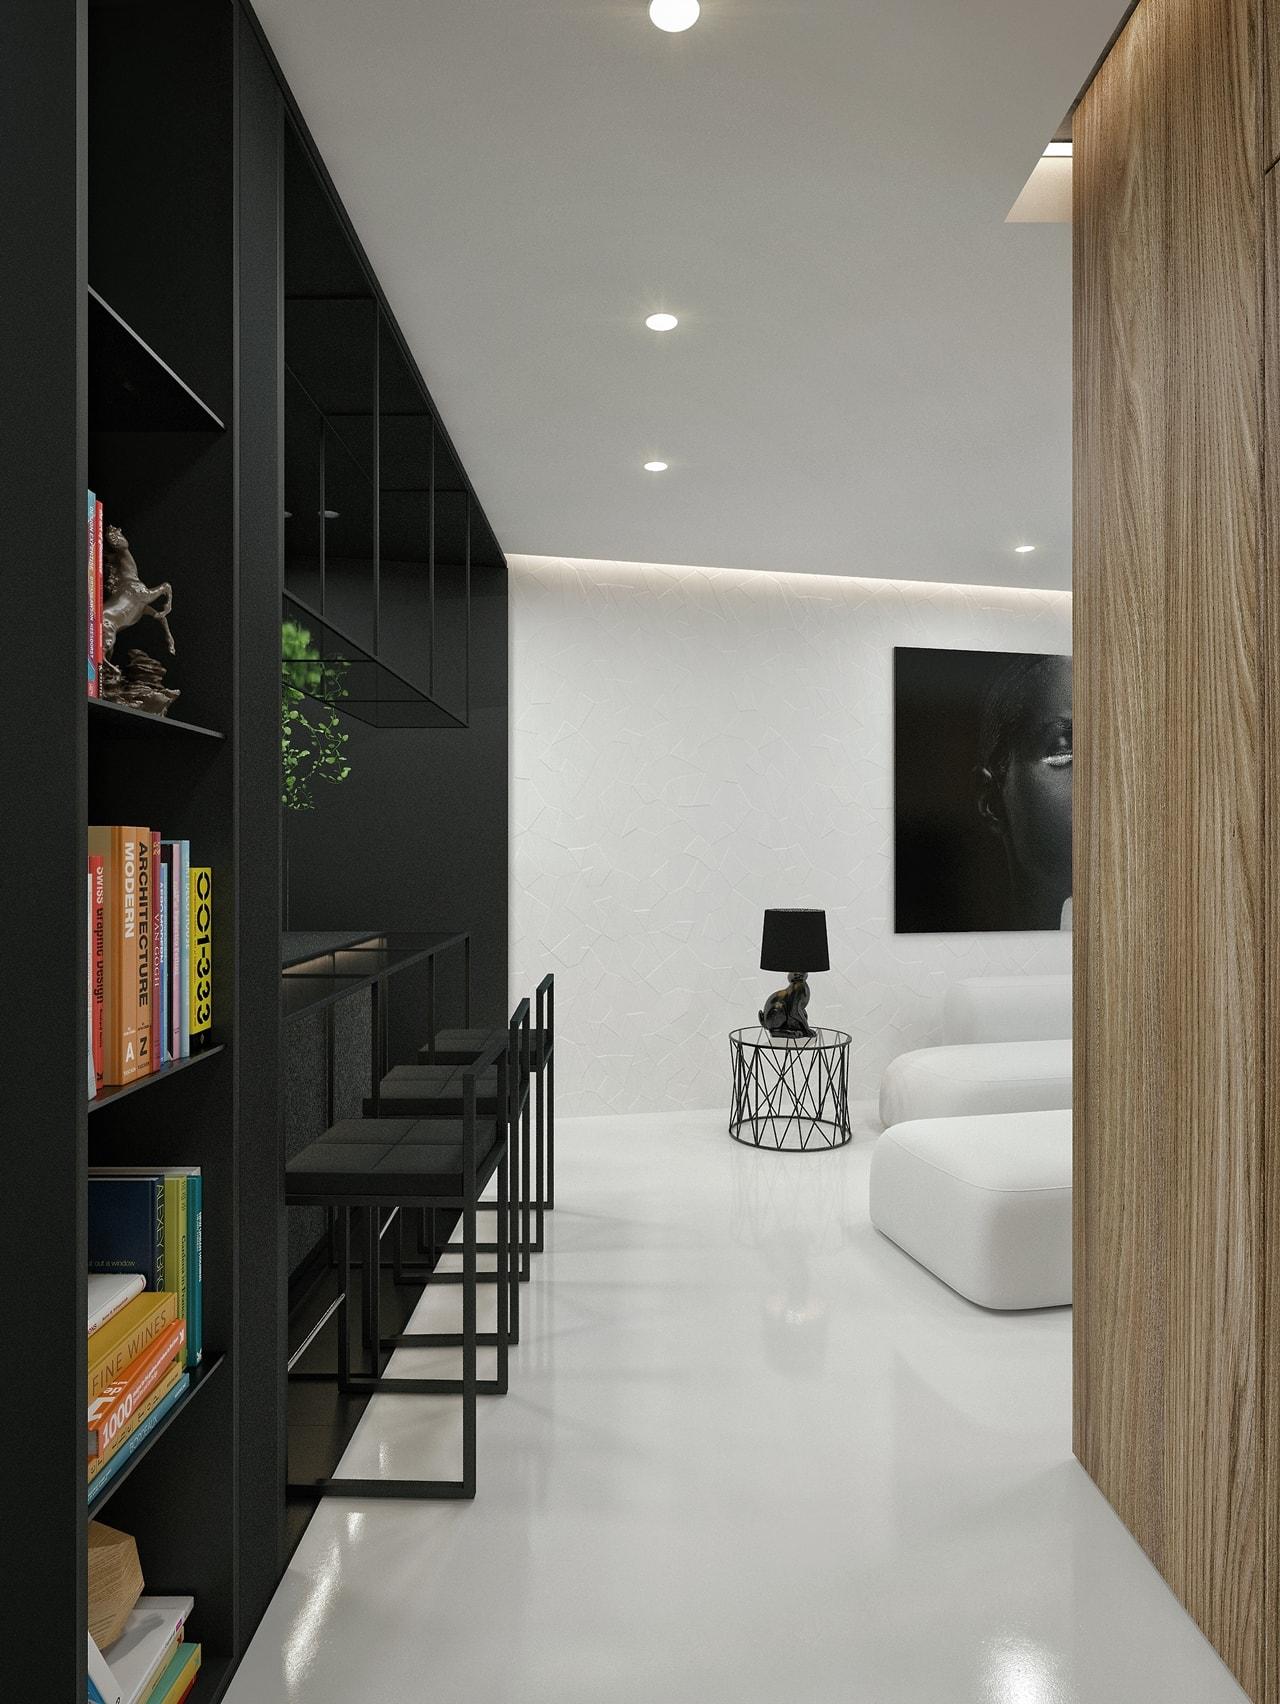 Black and white interior design by ID White